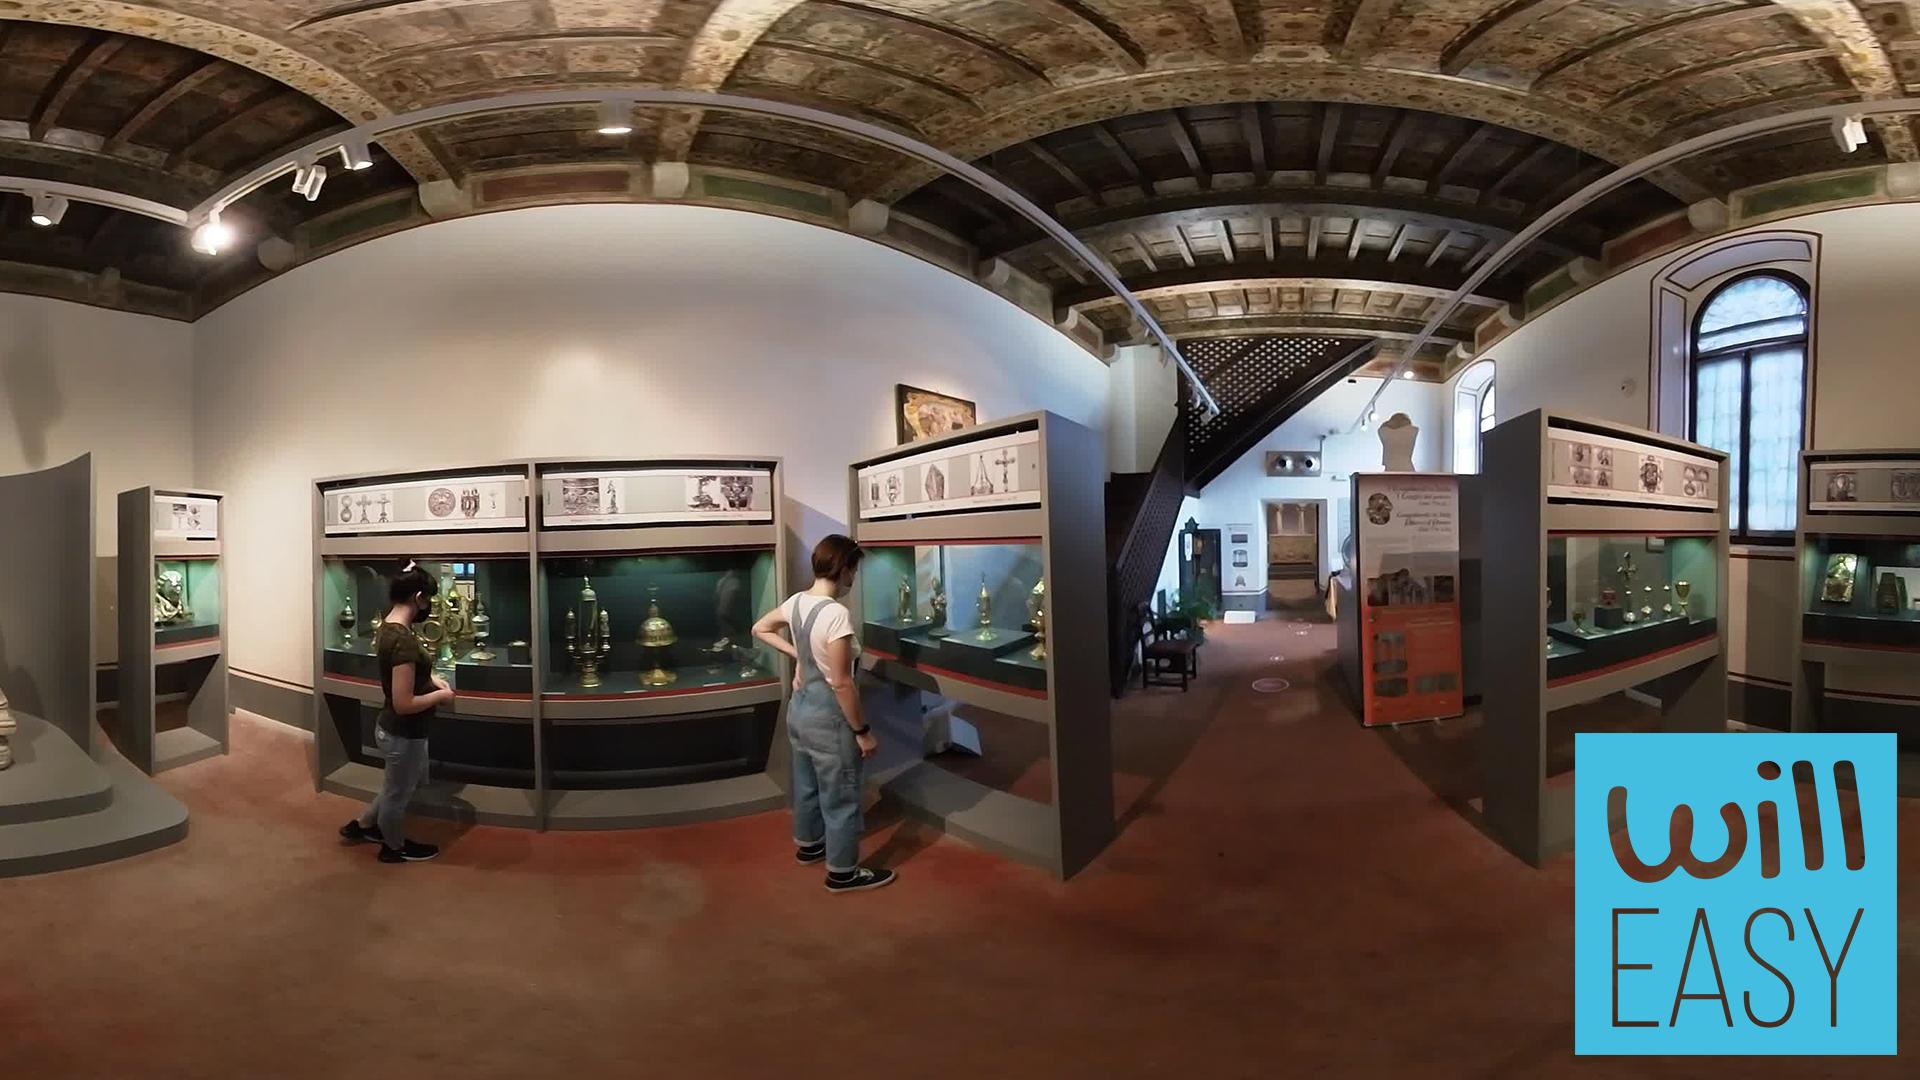 MUSEO CRISTIANO CIVIDALE FRIULI